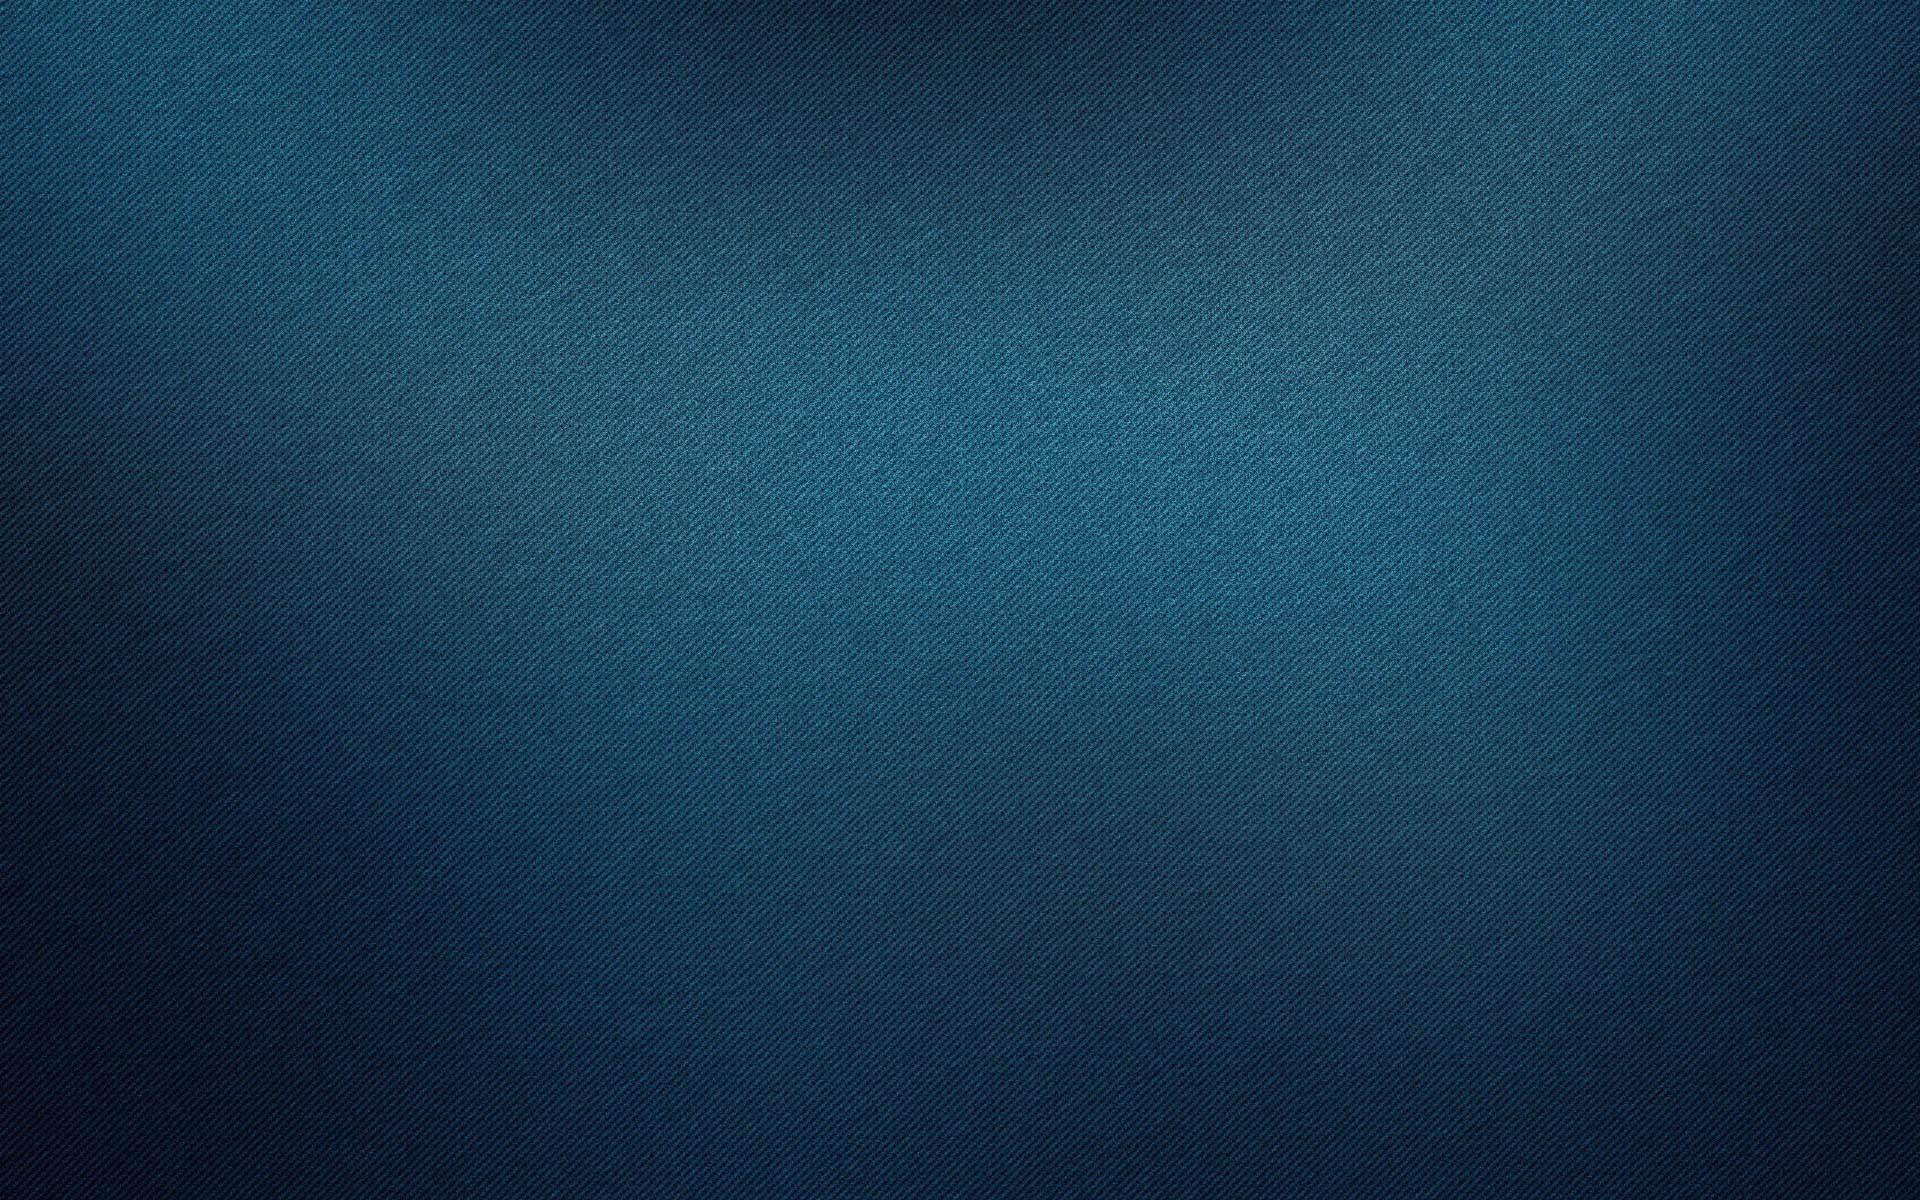 Minimalistic Textures Simple Wallpaper